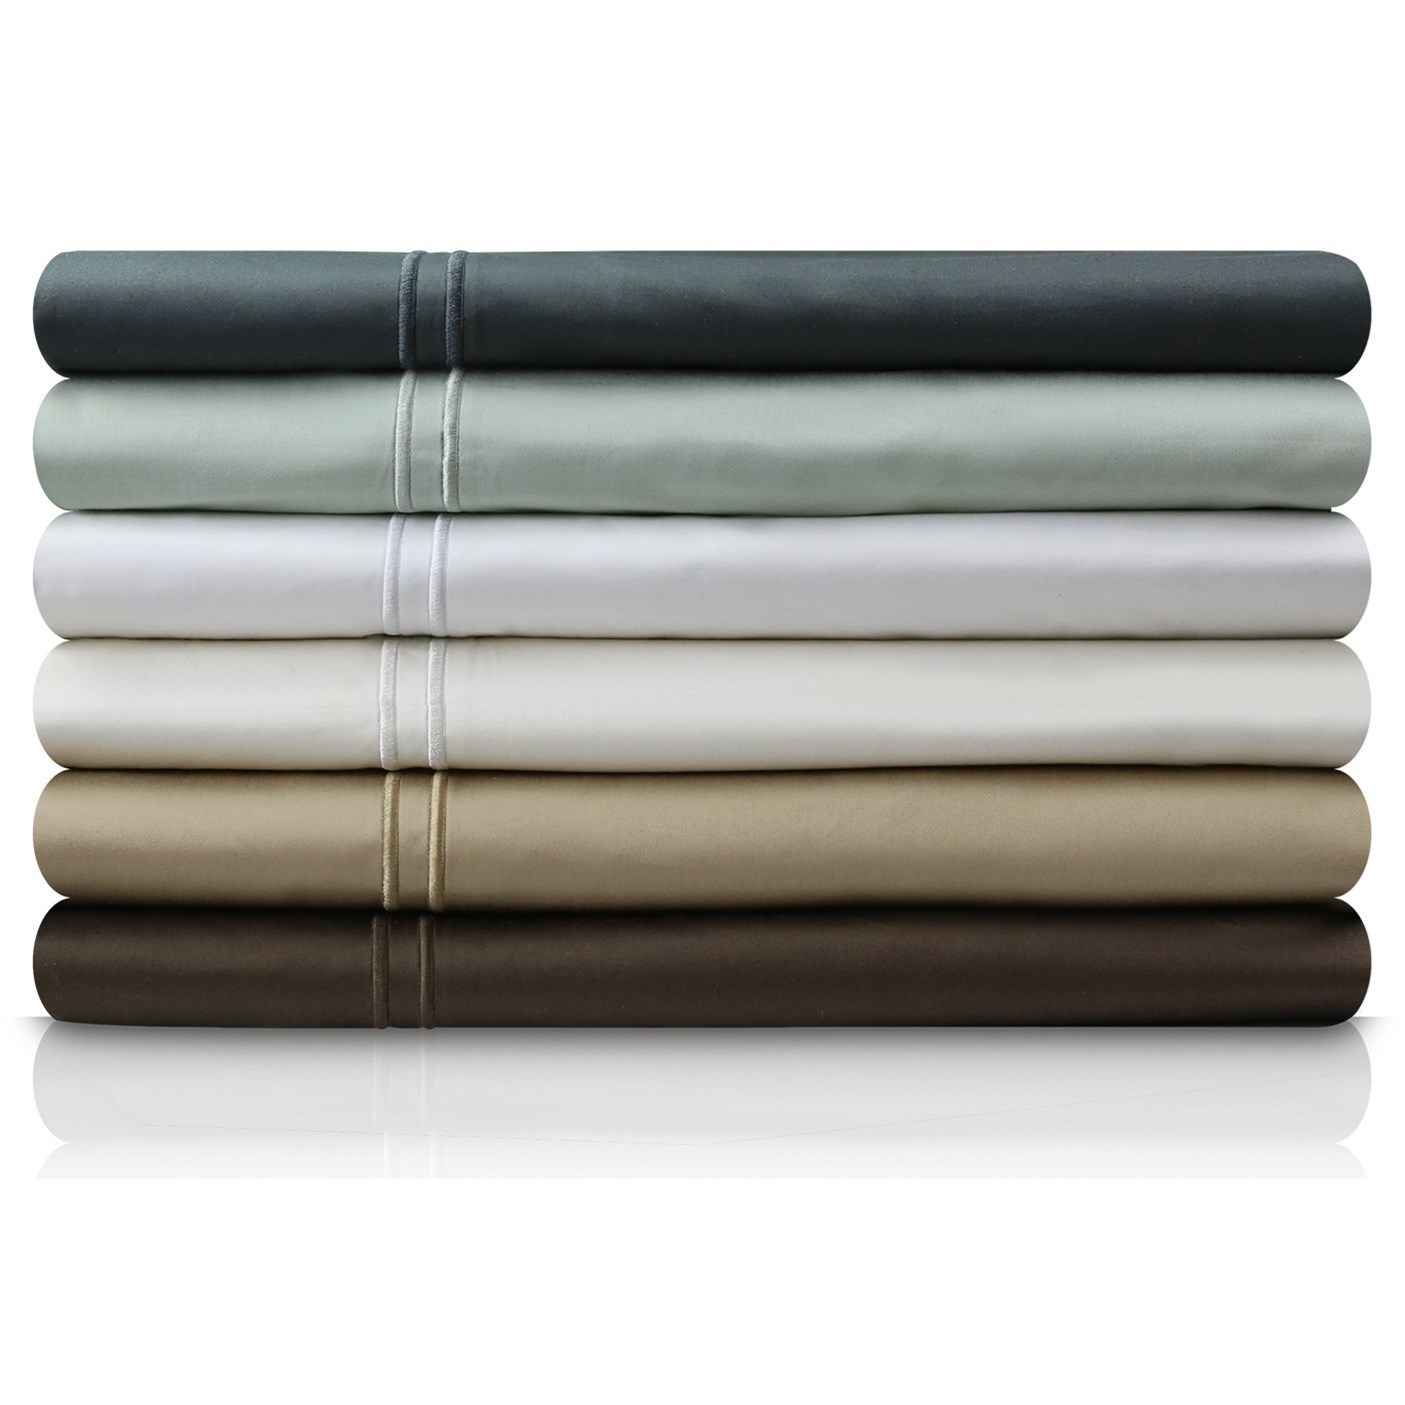 Malouf Egyptian Cotton Full XL 400 TC Egyptian Cotton Sheet Set - Item Number: MA04FXIVSS